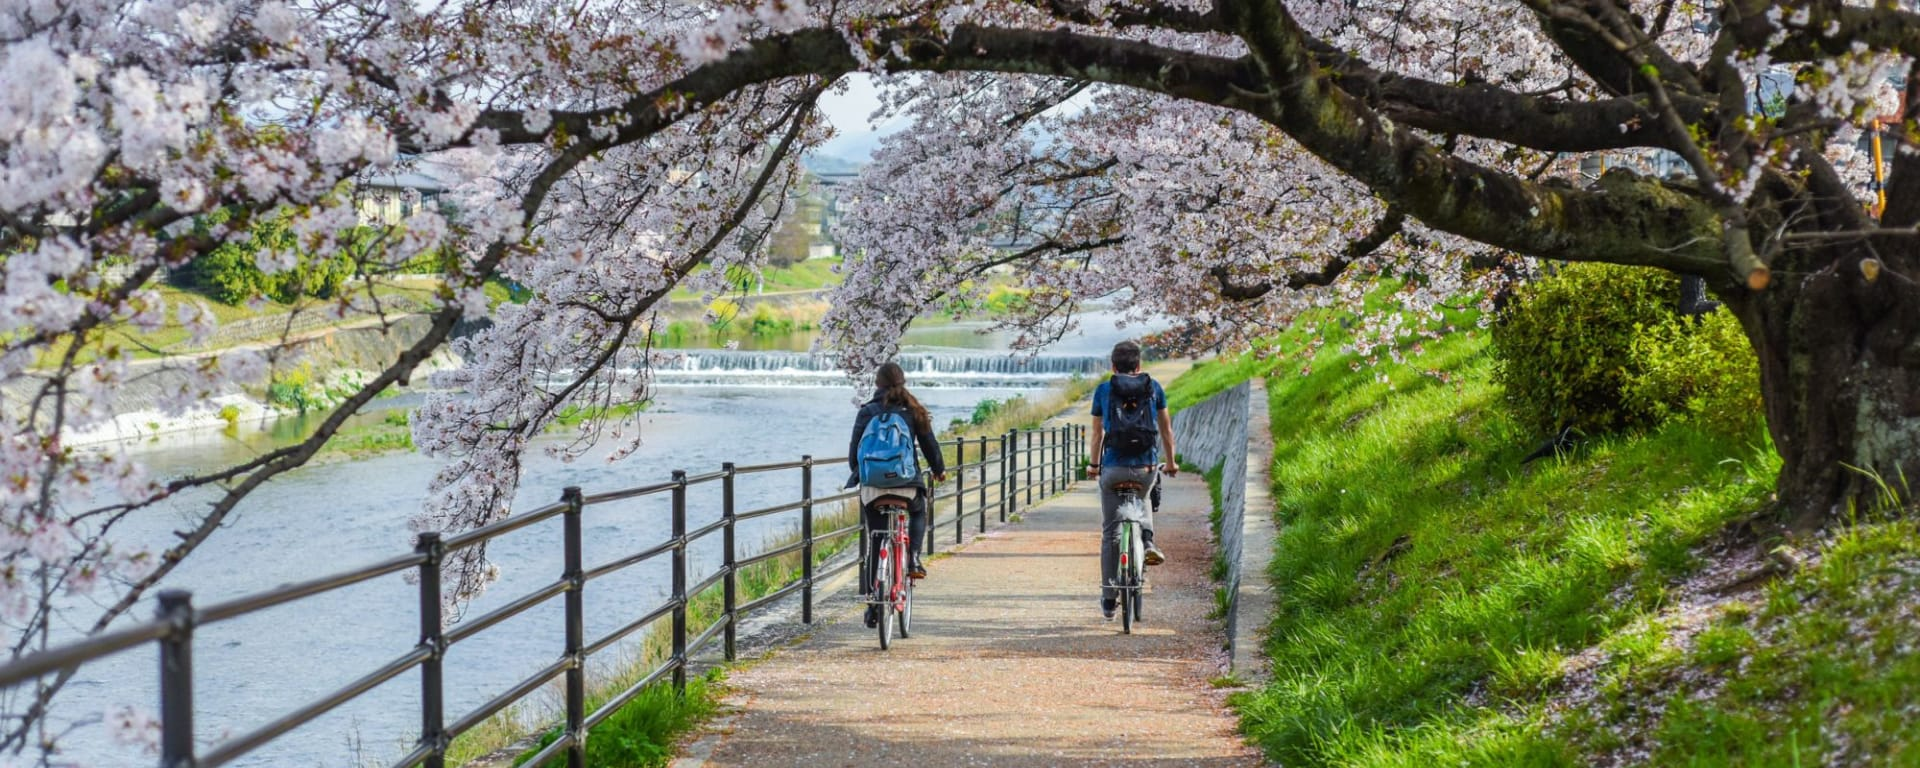 Côté méconnu de Kyoto à vélo - demi journée: Kyoto Kamokawa River